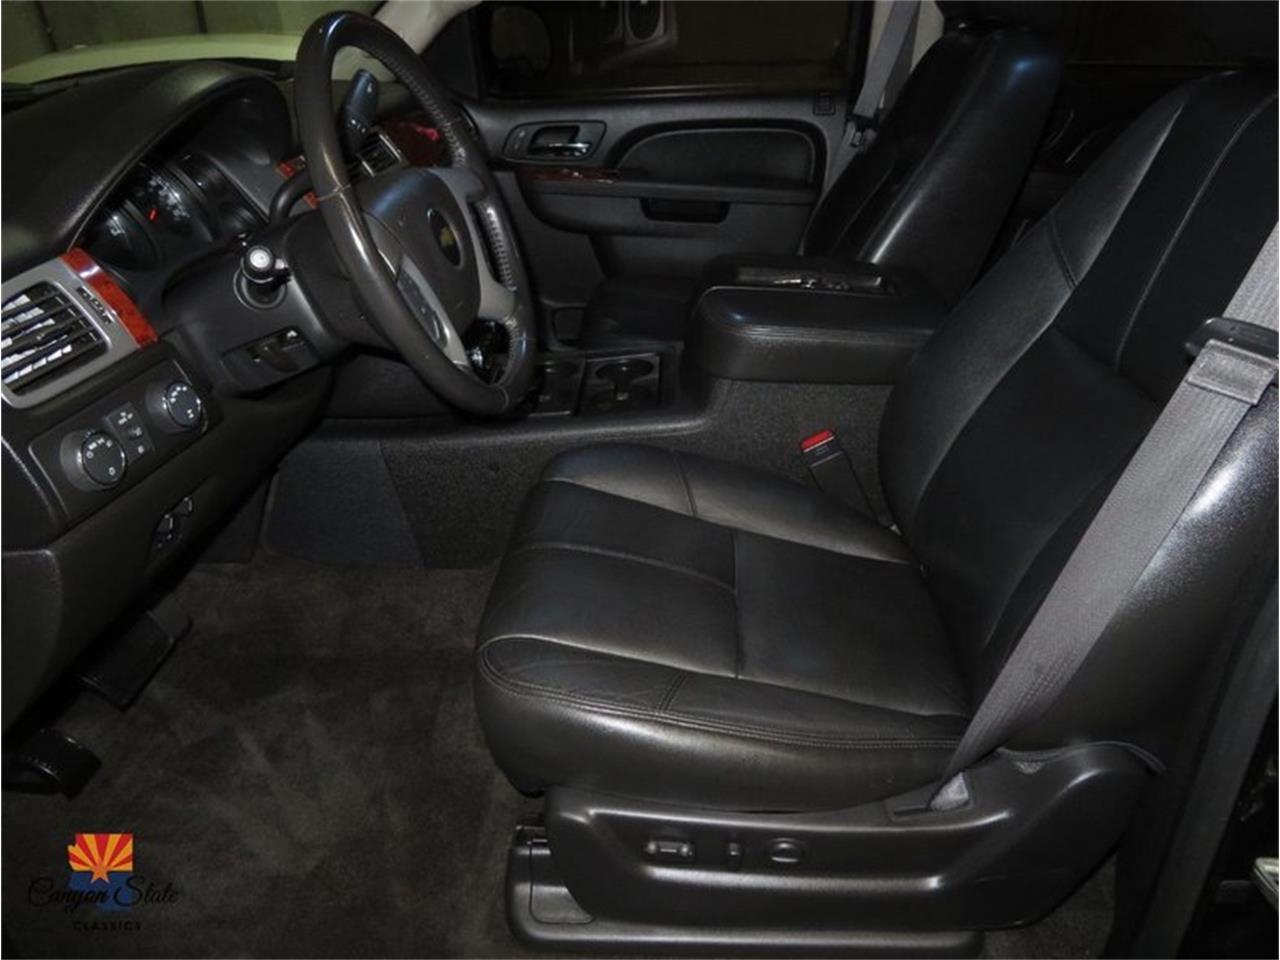 2013 Chevrolet Suburban (CC-1420603) for sale in Tempe, Arizona